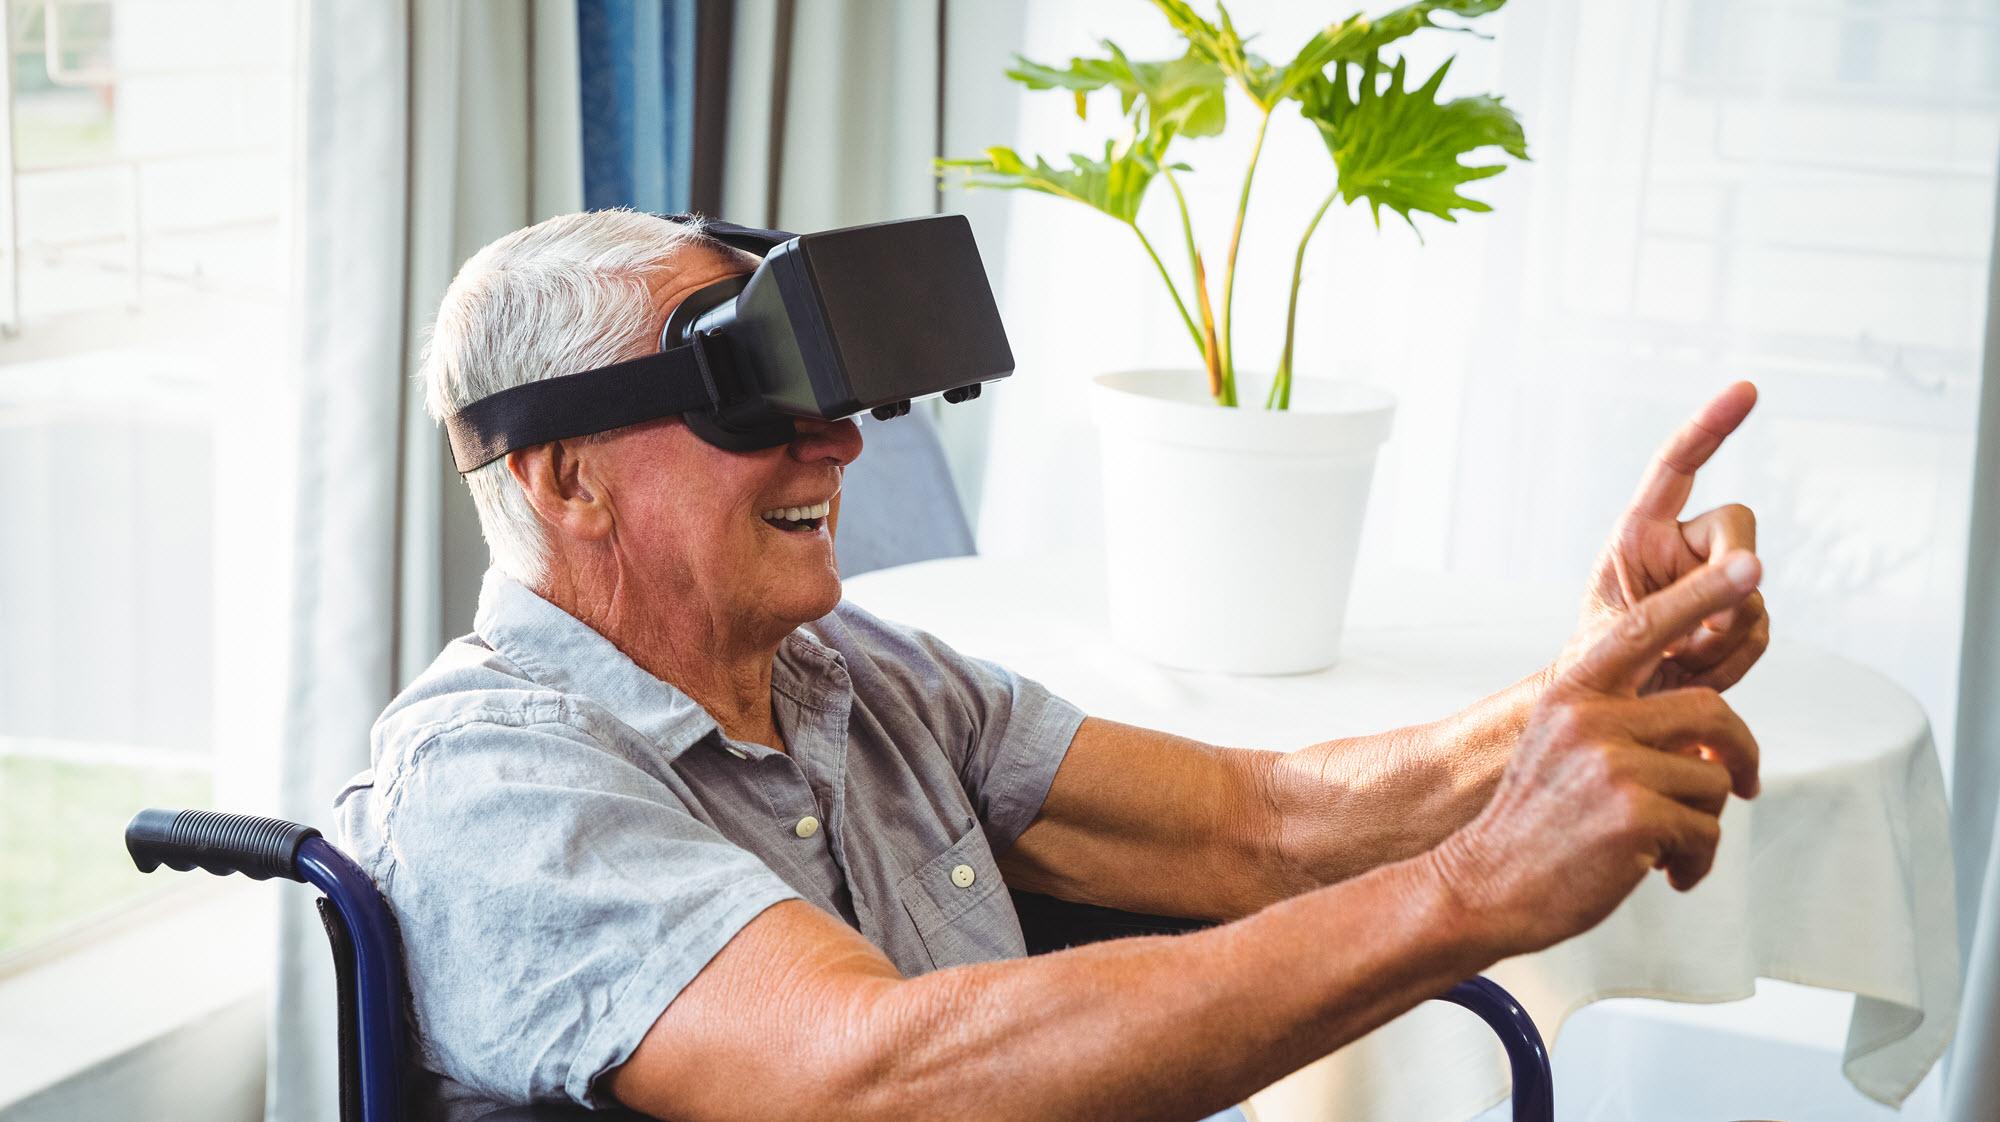 Transforming Palliative Healthcare Through Virtual Reality